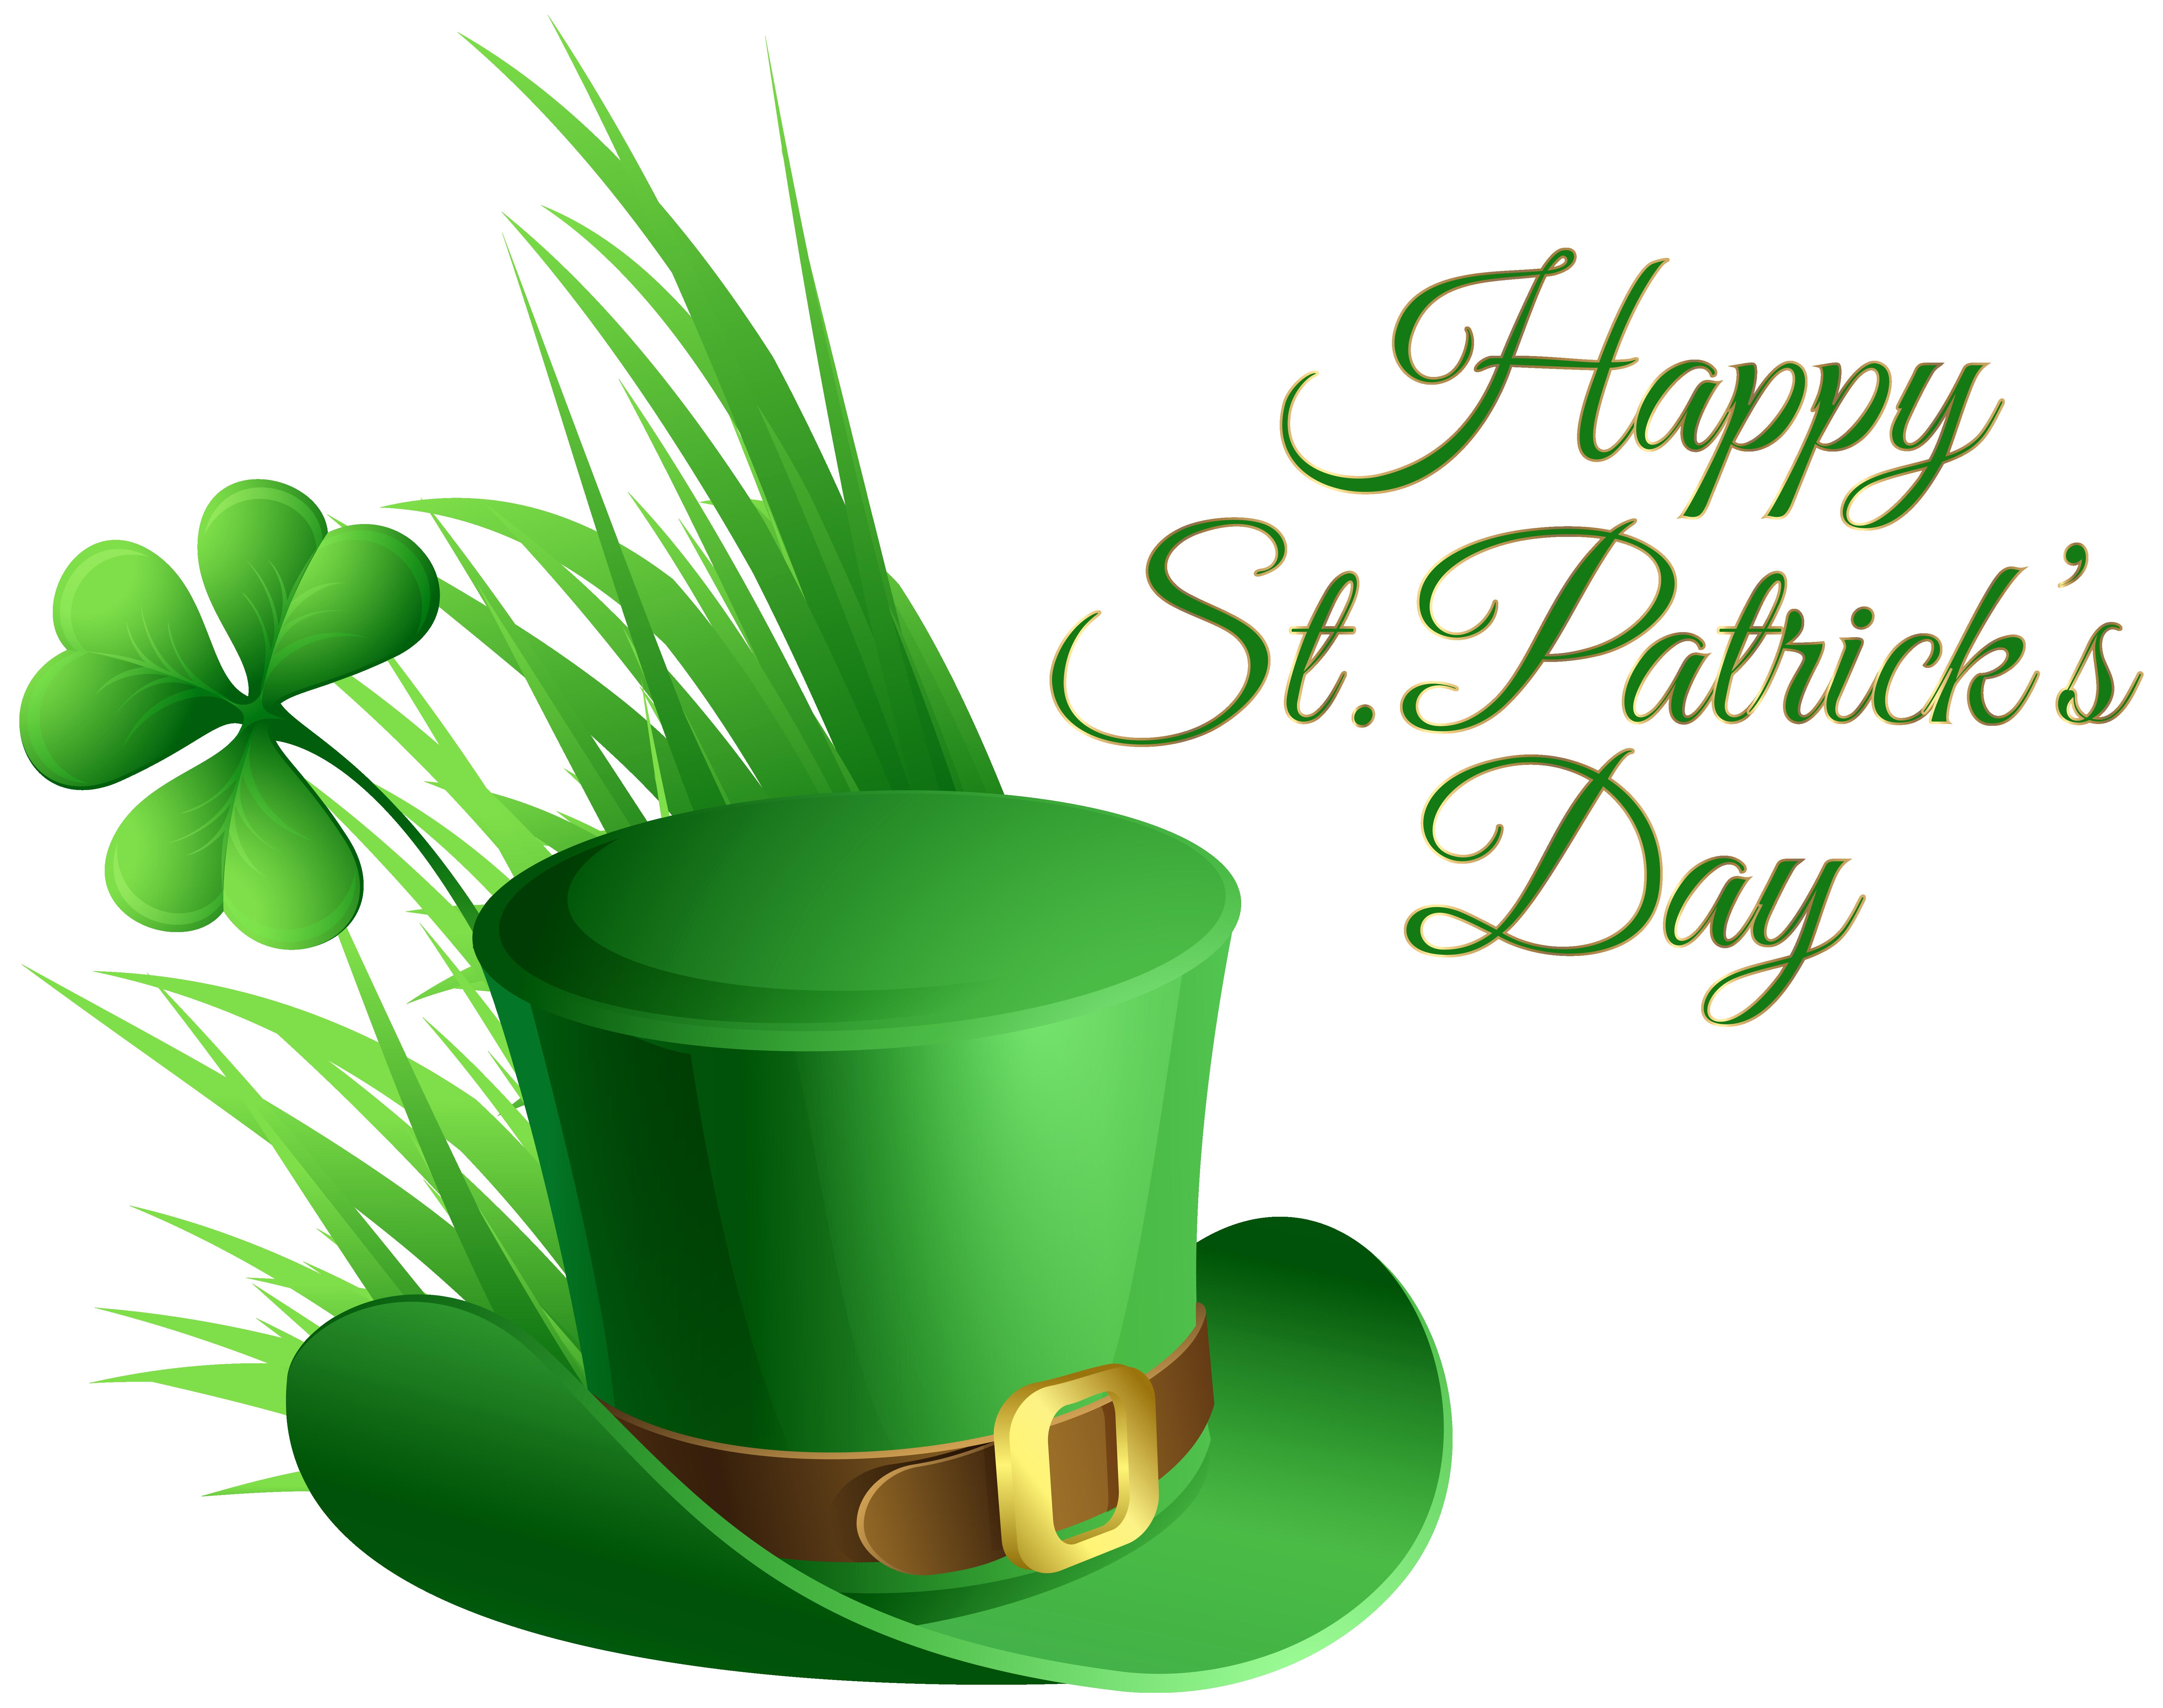 7246x5723 St Patricks Day Hat And Shamrock Transparent Clip Art Image